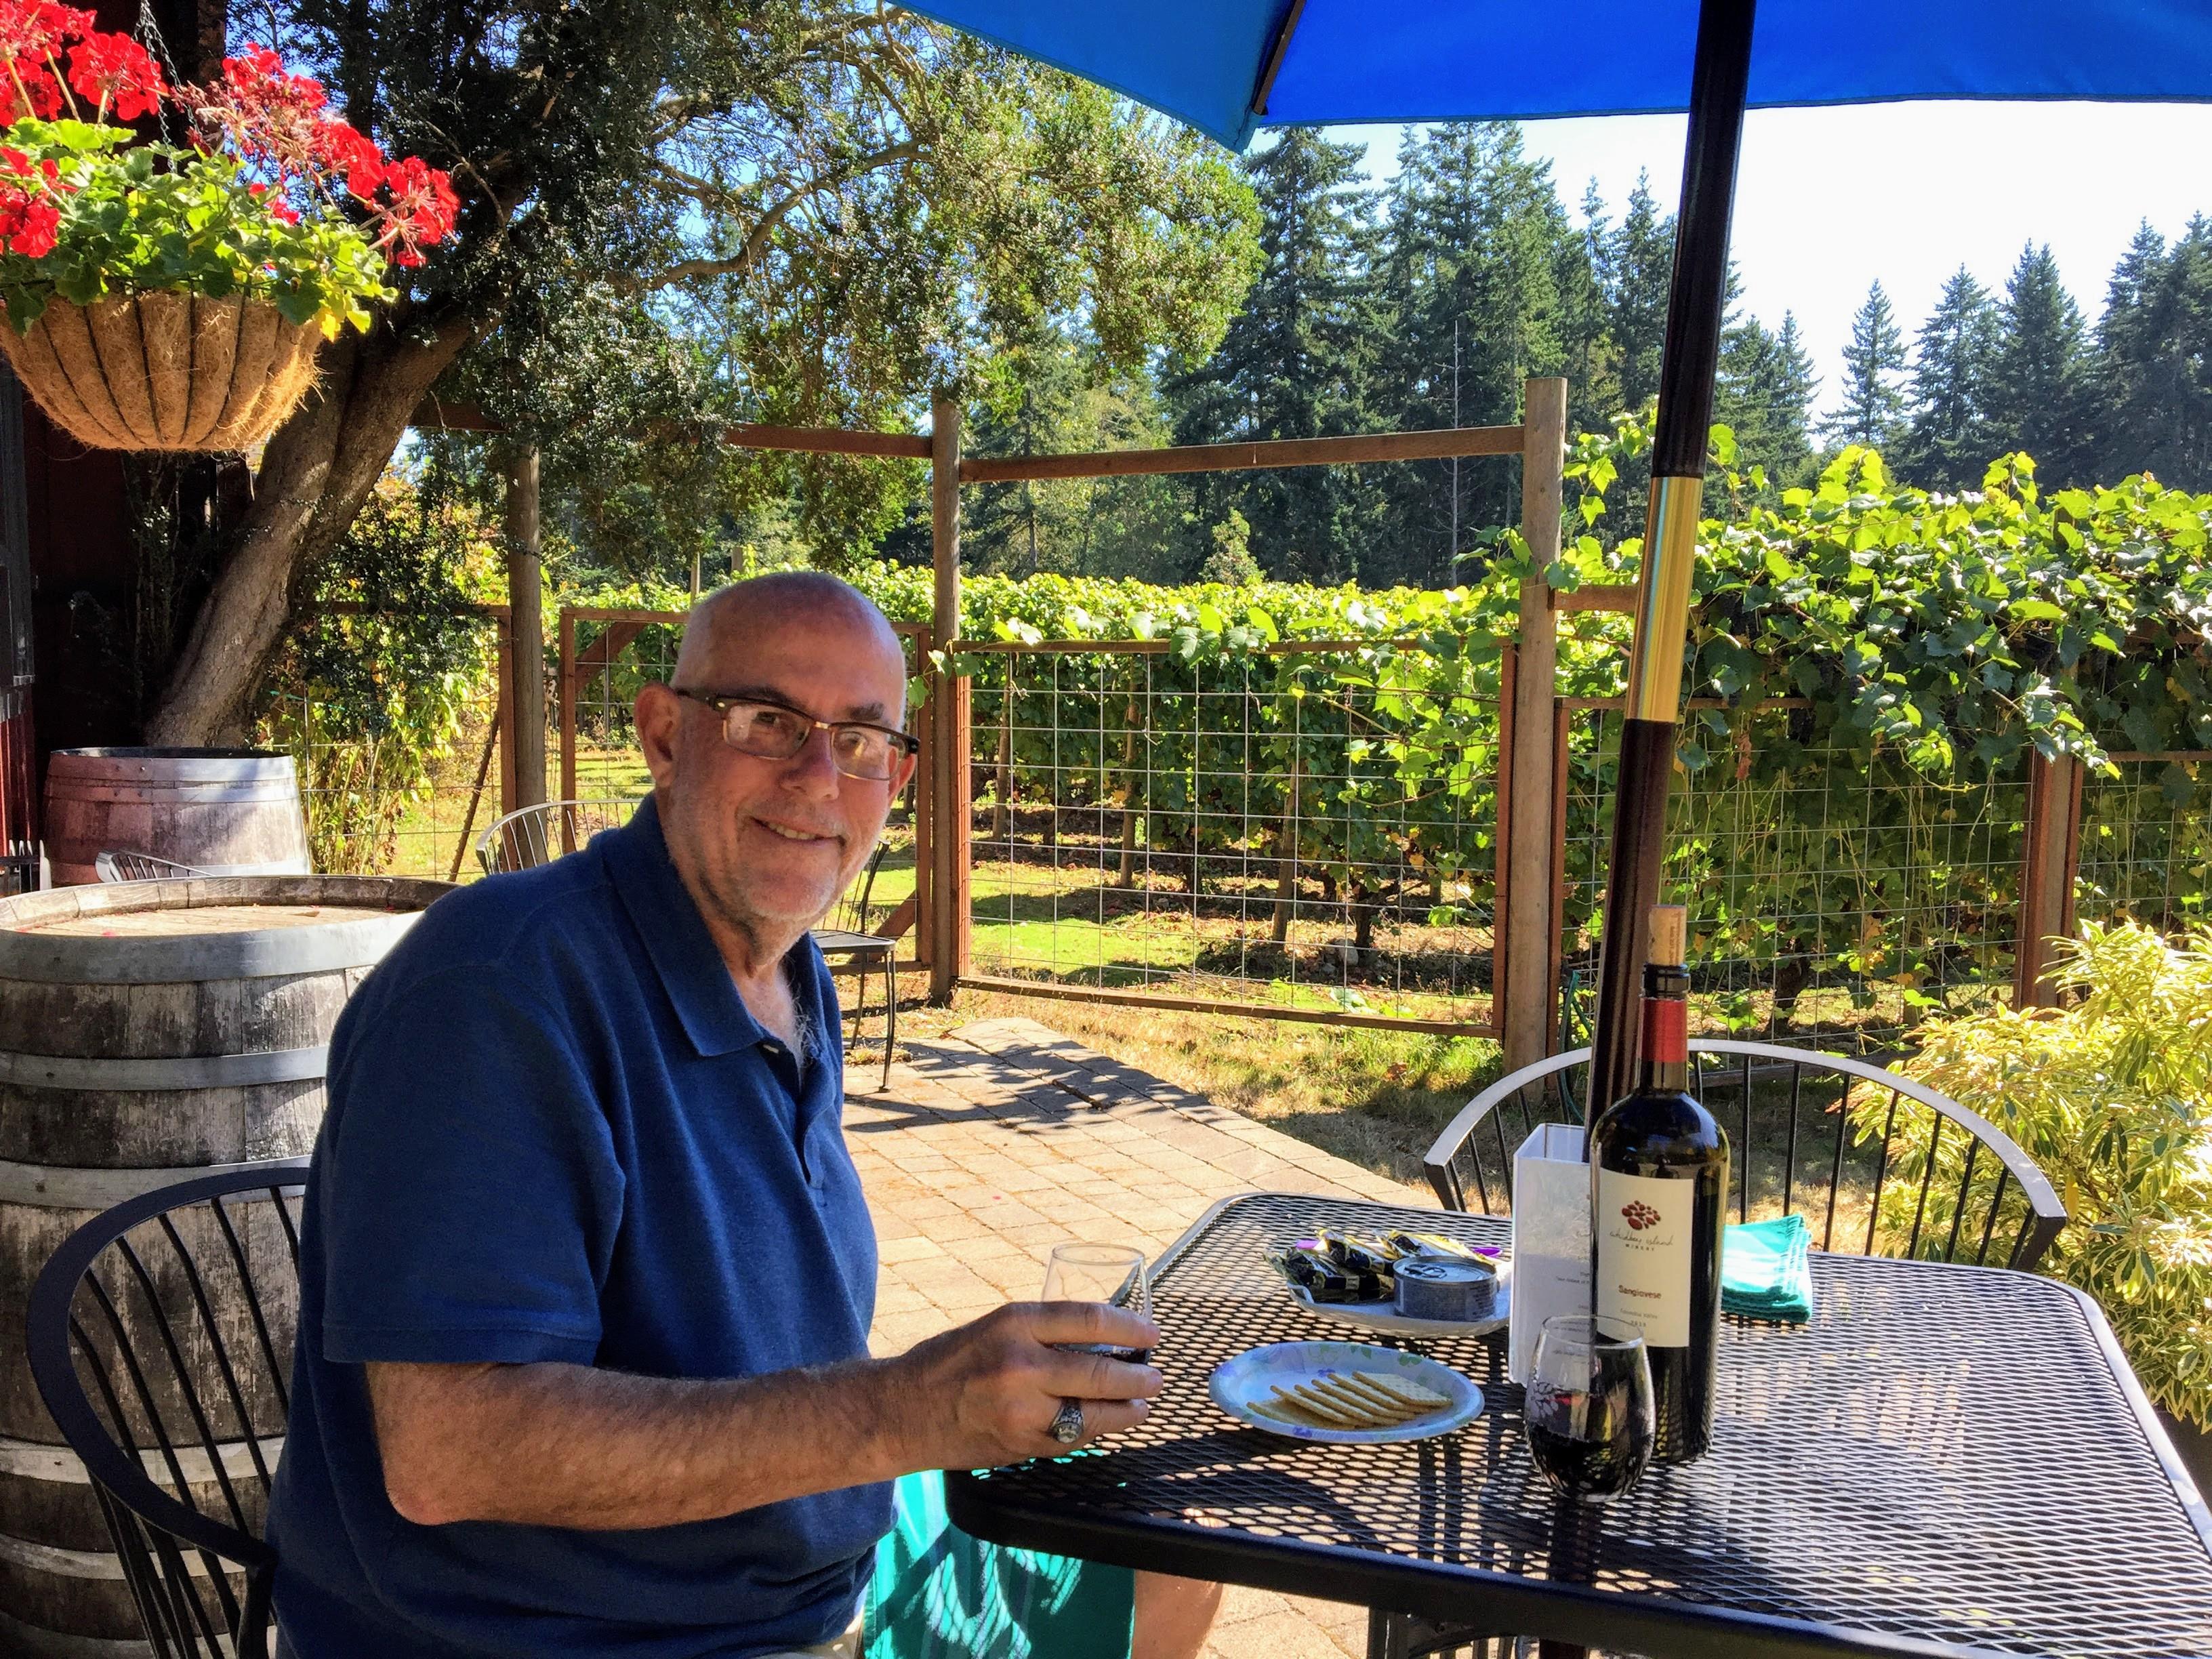 2017-09-27 Washington 01 Langley Winery 03